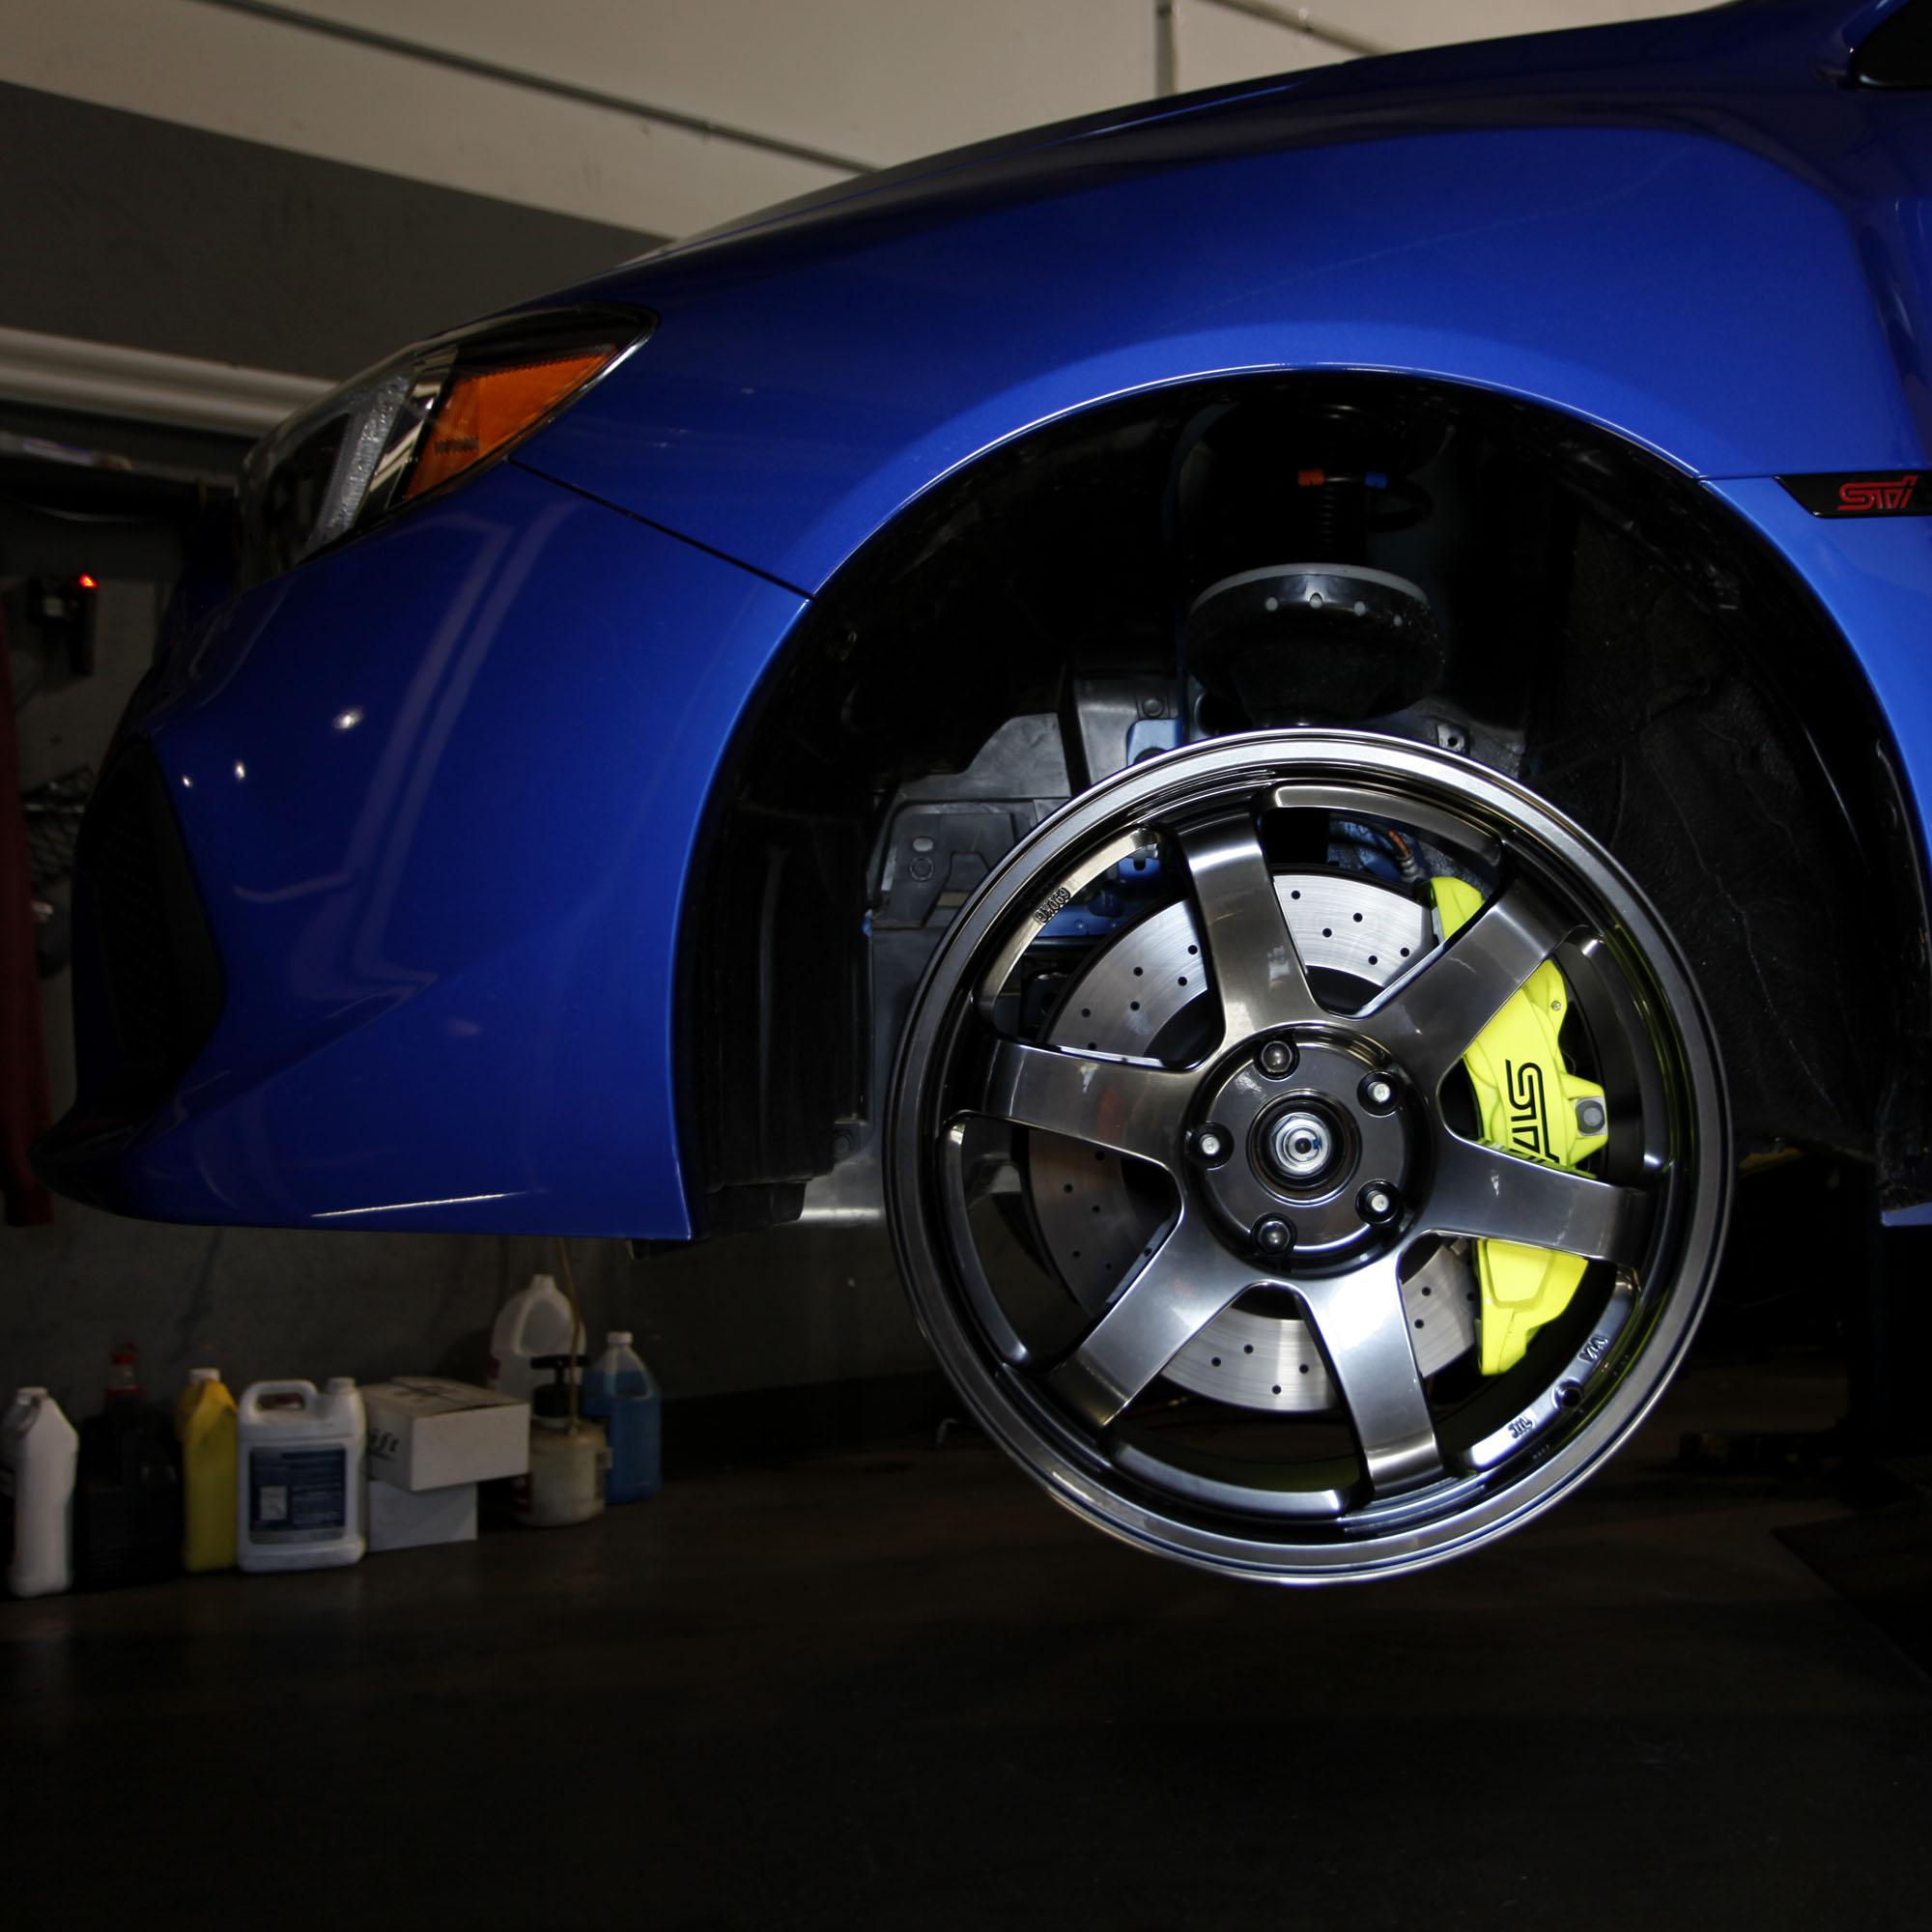 Subaru Sterling Va >> Tires/Wheels 2018 STI USDM Winter Wheels - Page 6 - Subaru Impreza WRX STI Forums: IWSTI.com